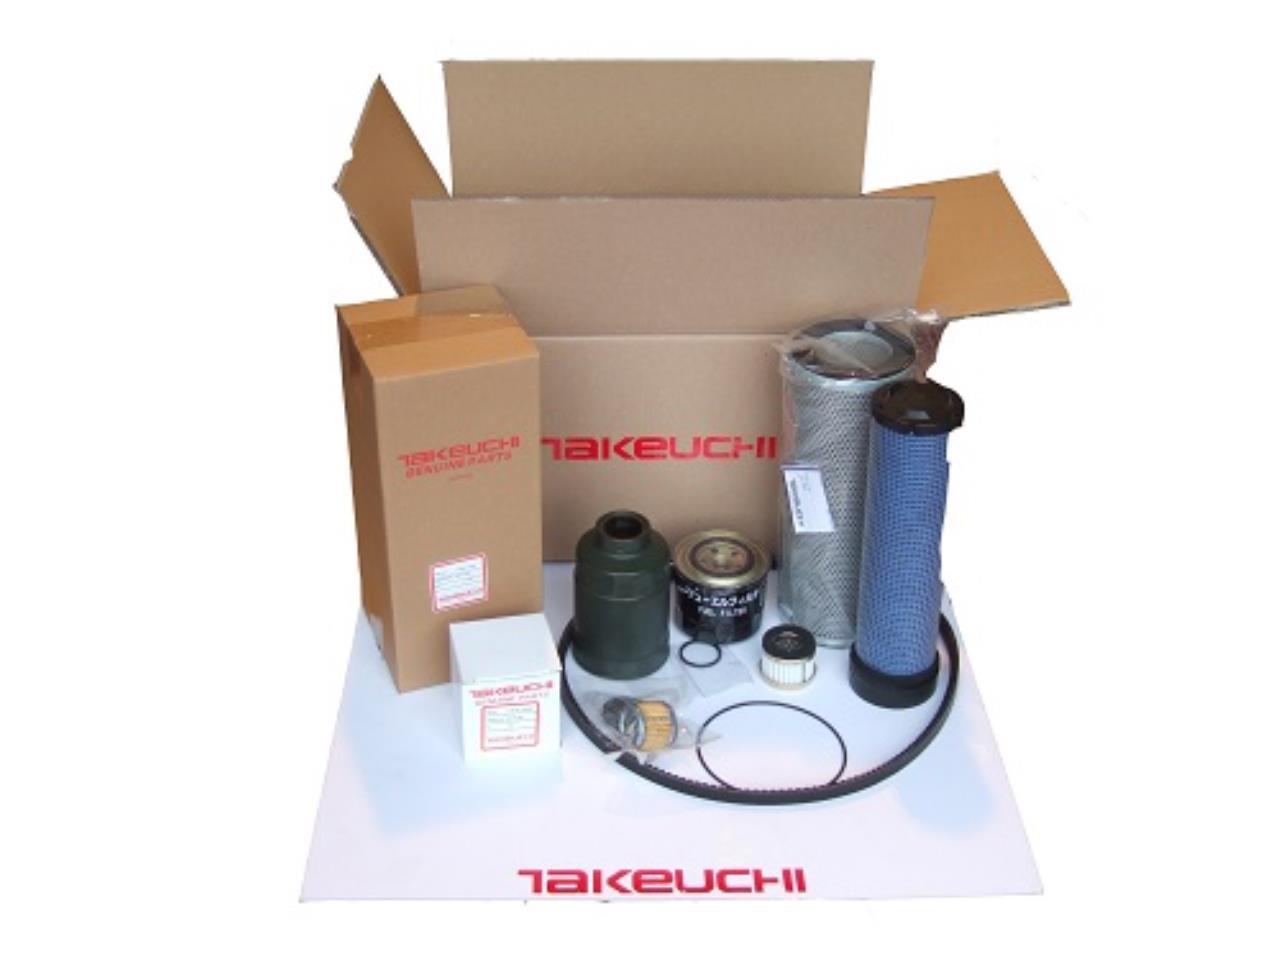 Takeuchi TB175 filterkit, op til s/n: 17512104